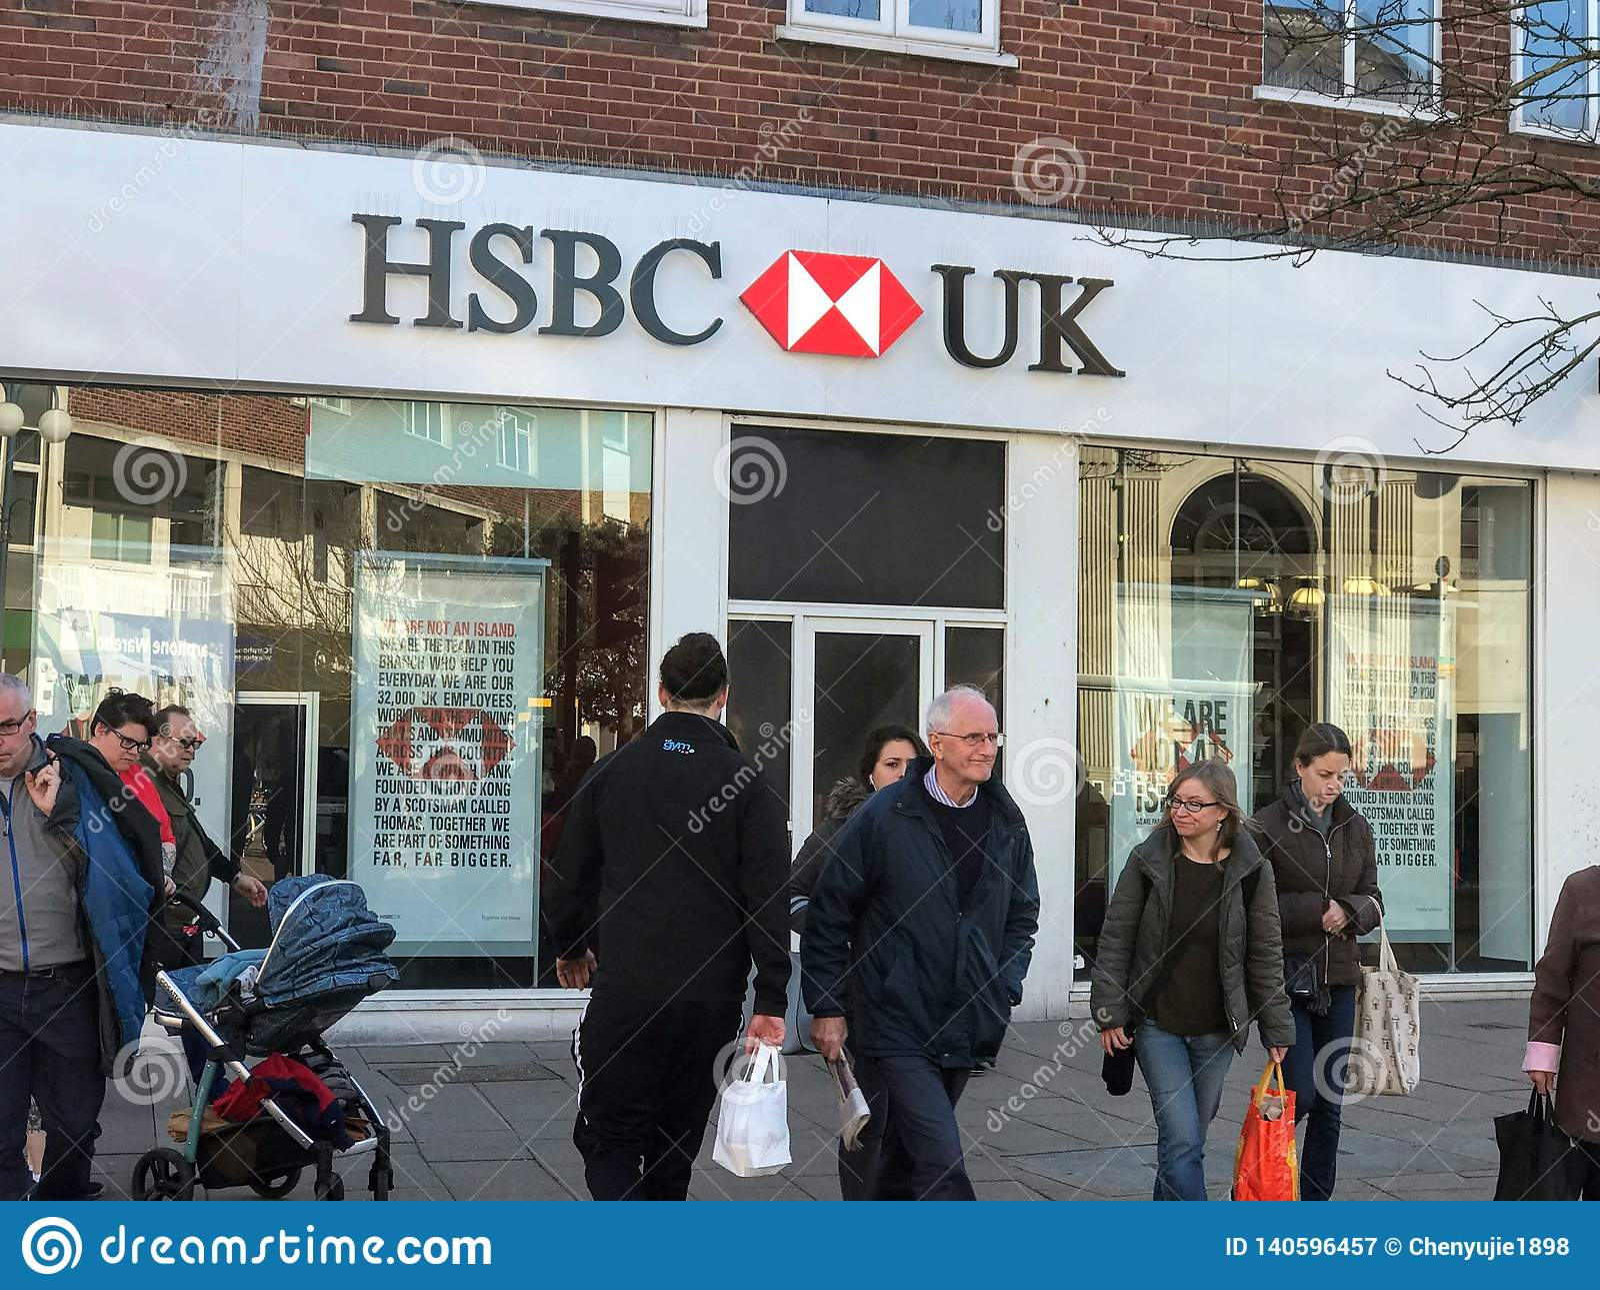 Hsbc uk bank branch editorial photography  Image of corporation